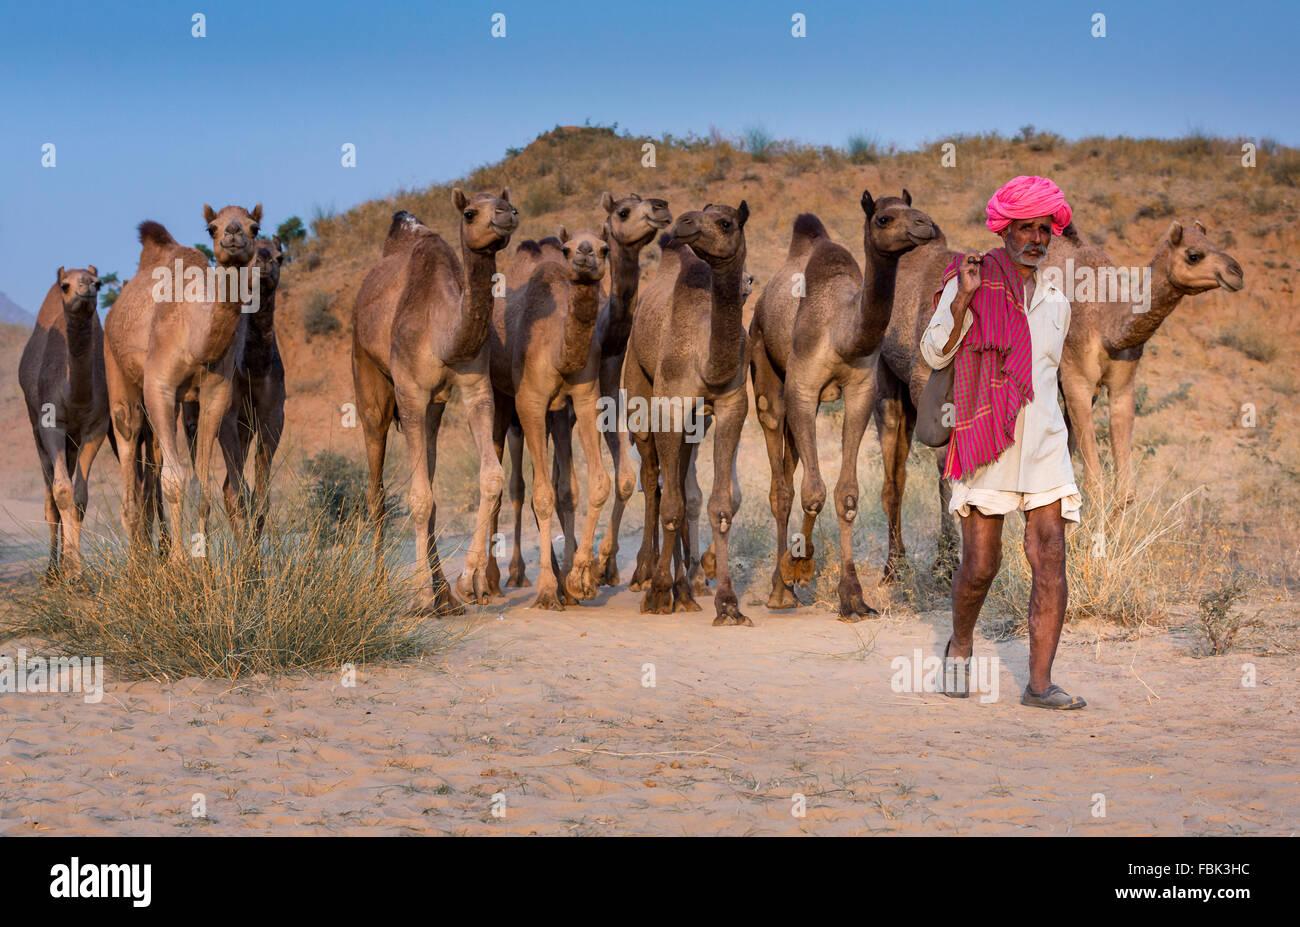 Kamel-Treiber mit seinen Kamelen auf dem Weg nach Pushkar Mela, Pushkar Camel Fair, Rajasthan, Indien Stockbild